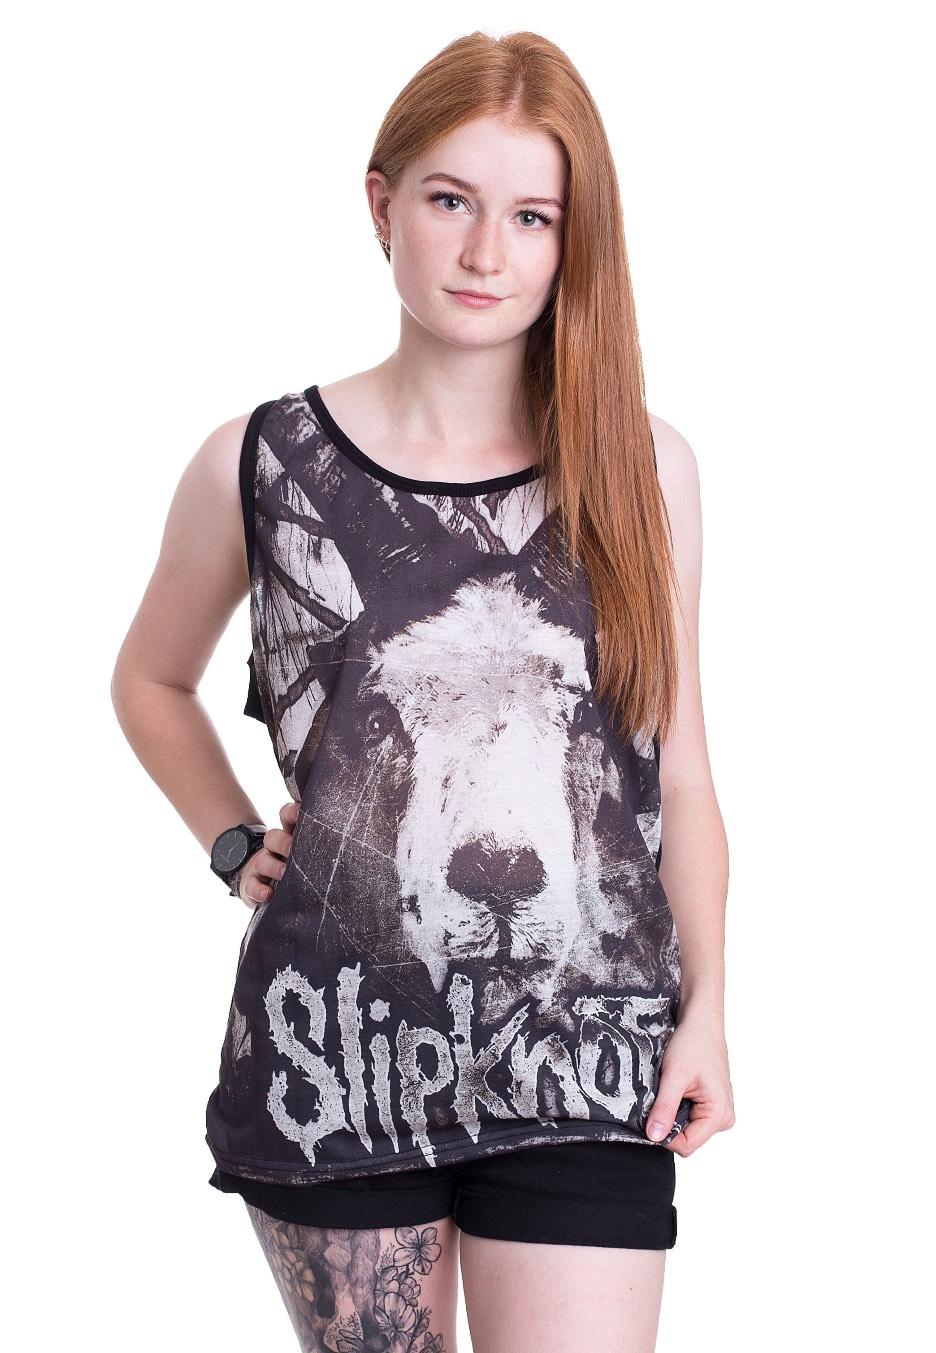 Slipknot - Etched Goat Allover - Tank - Official NU Metal ... f7092b060